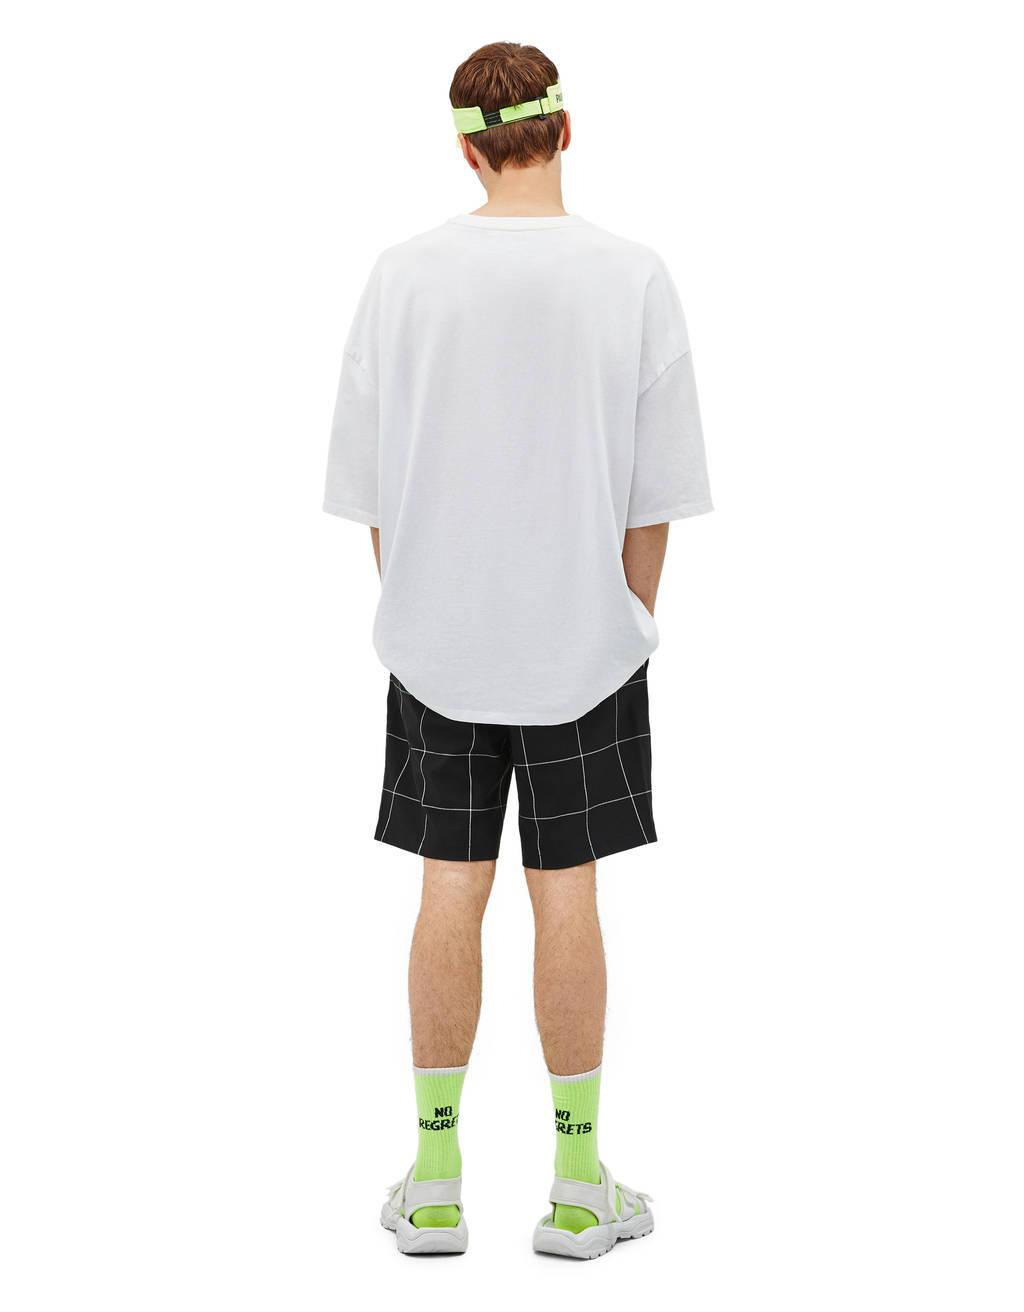 Jogger-style Bermuda shorts